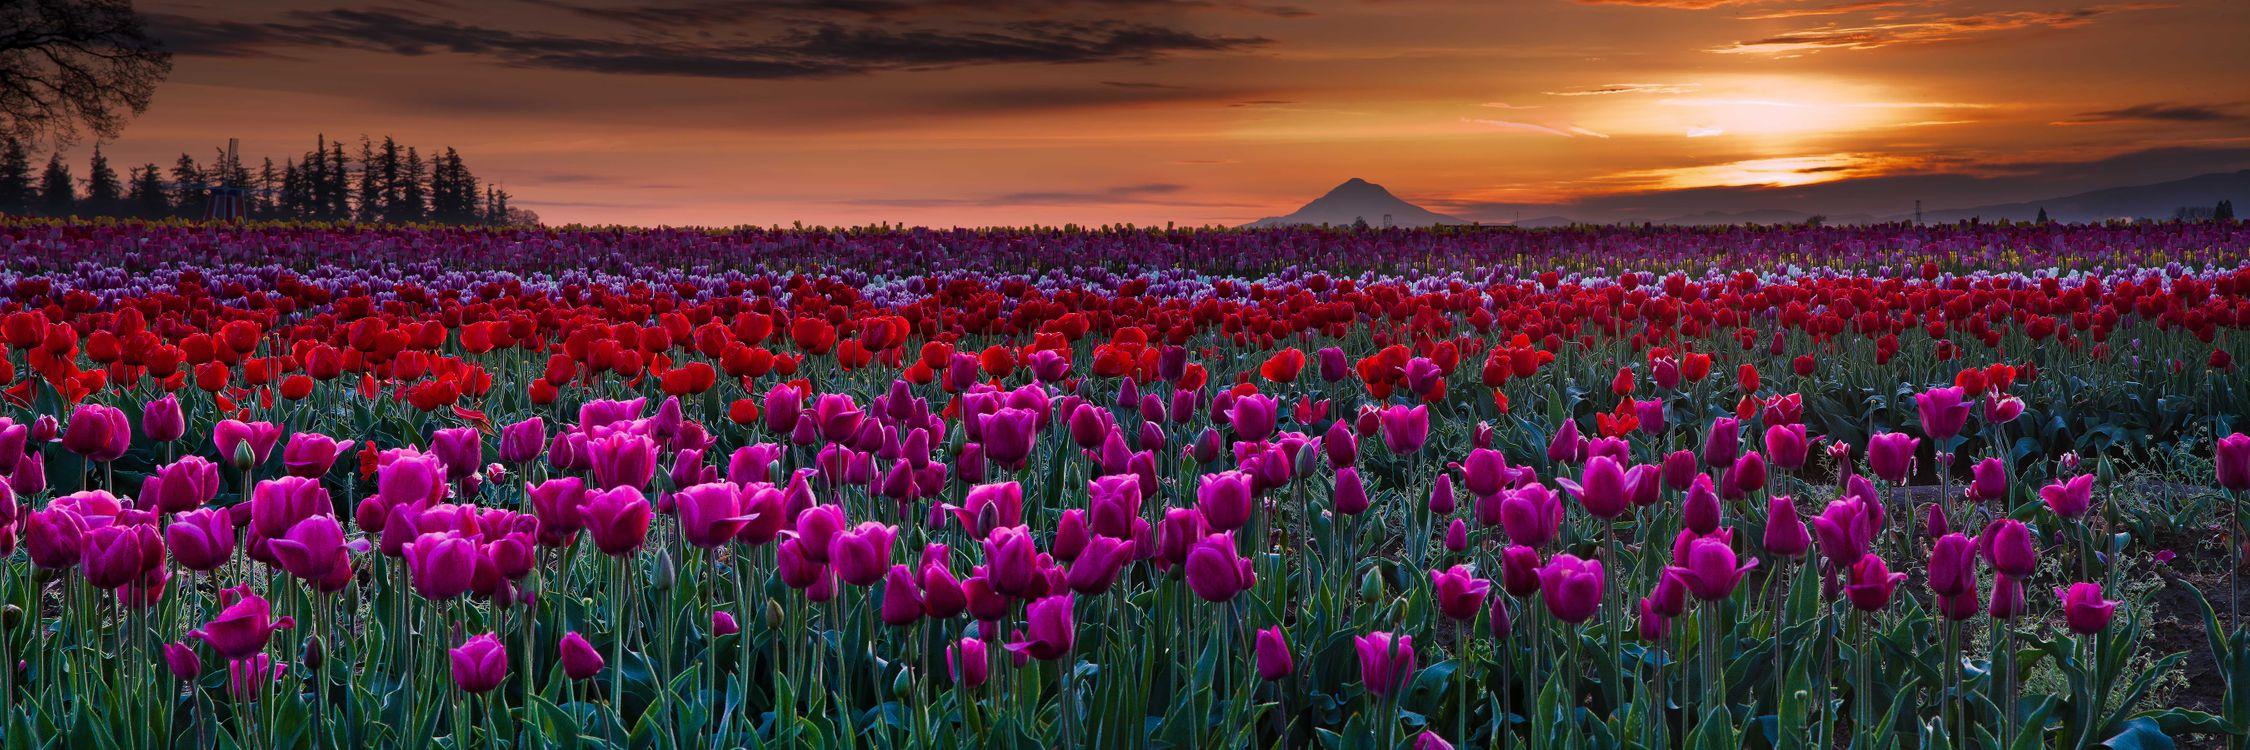 Фото бесплатно поле тюльпанов, закат солнца, поле, тюльпаны, цветы, флора, пейзаж, панорама, цветы